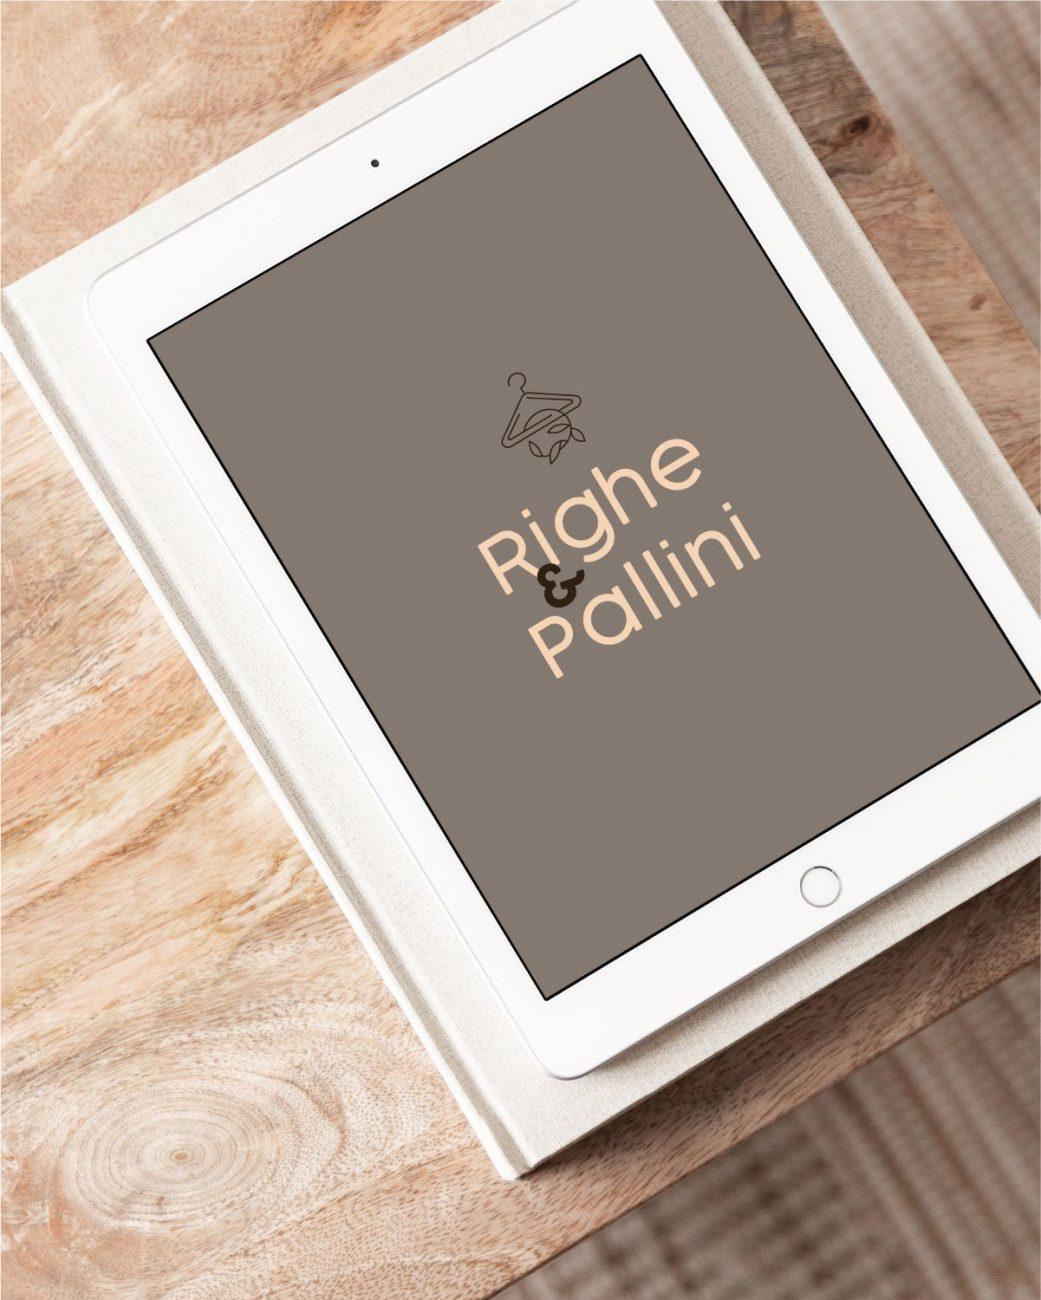 RIGHE & PALLINI logo design copertina